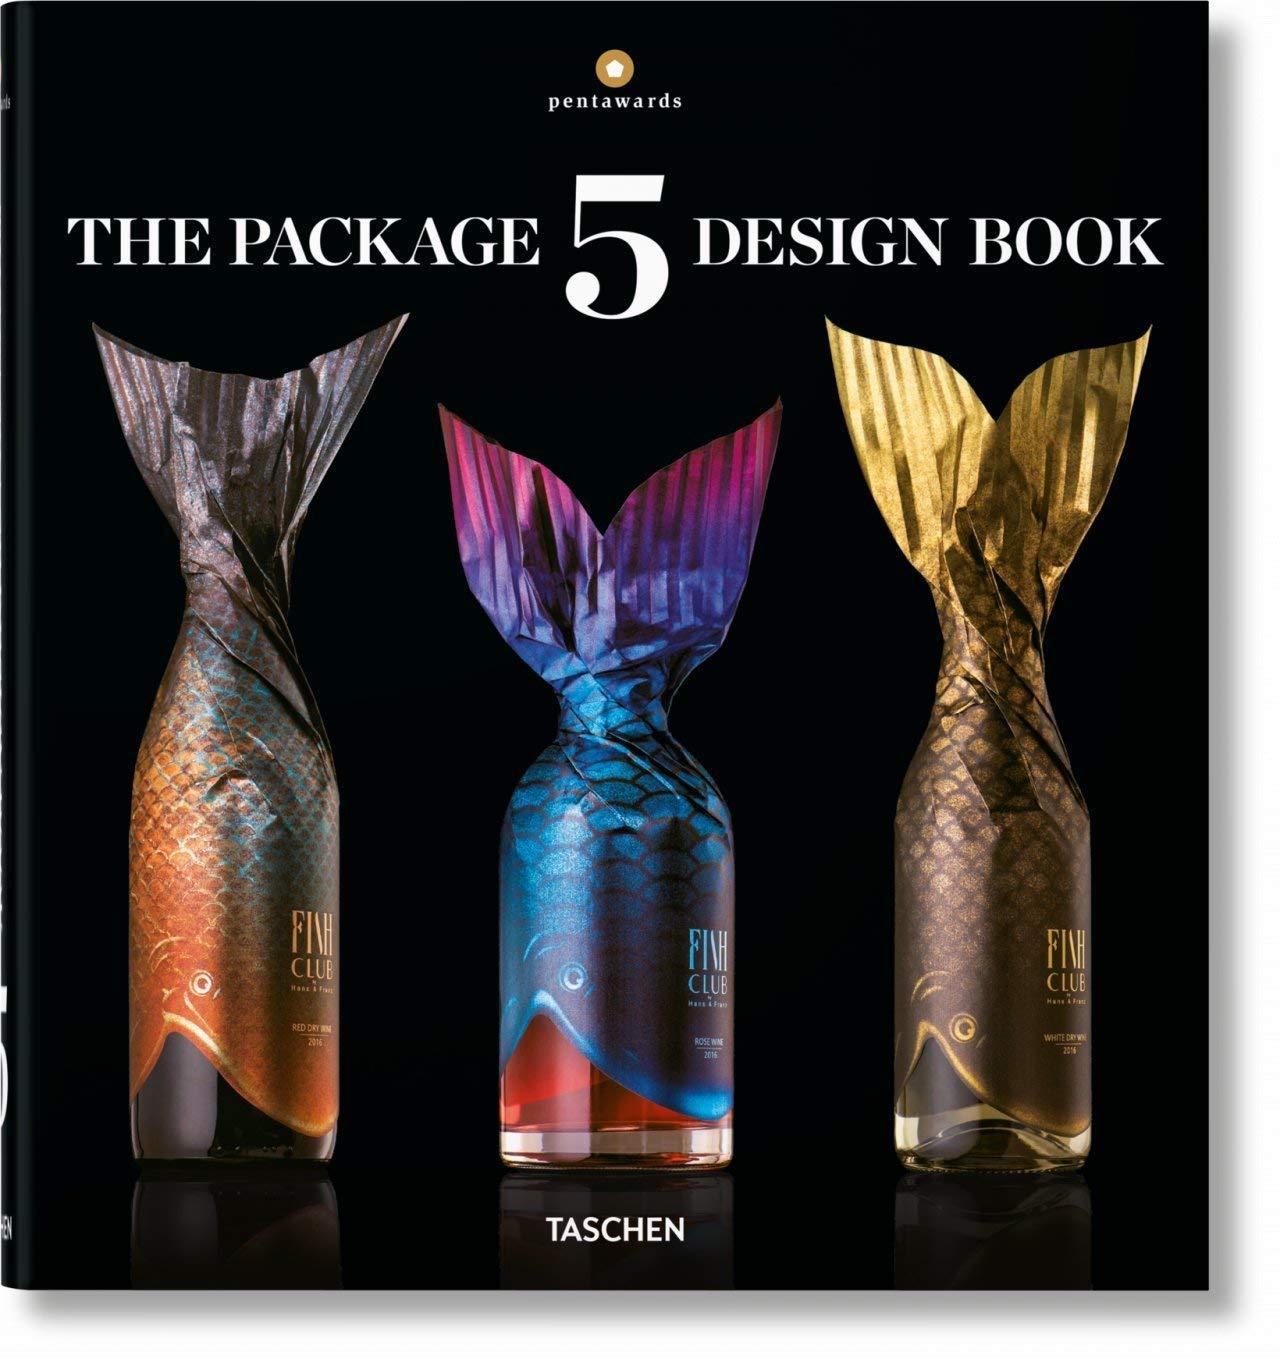 The Package Design Book 5 (VARIA): Pentawards, Julius